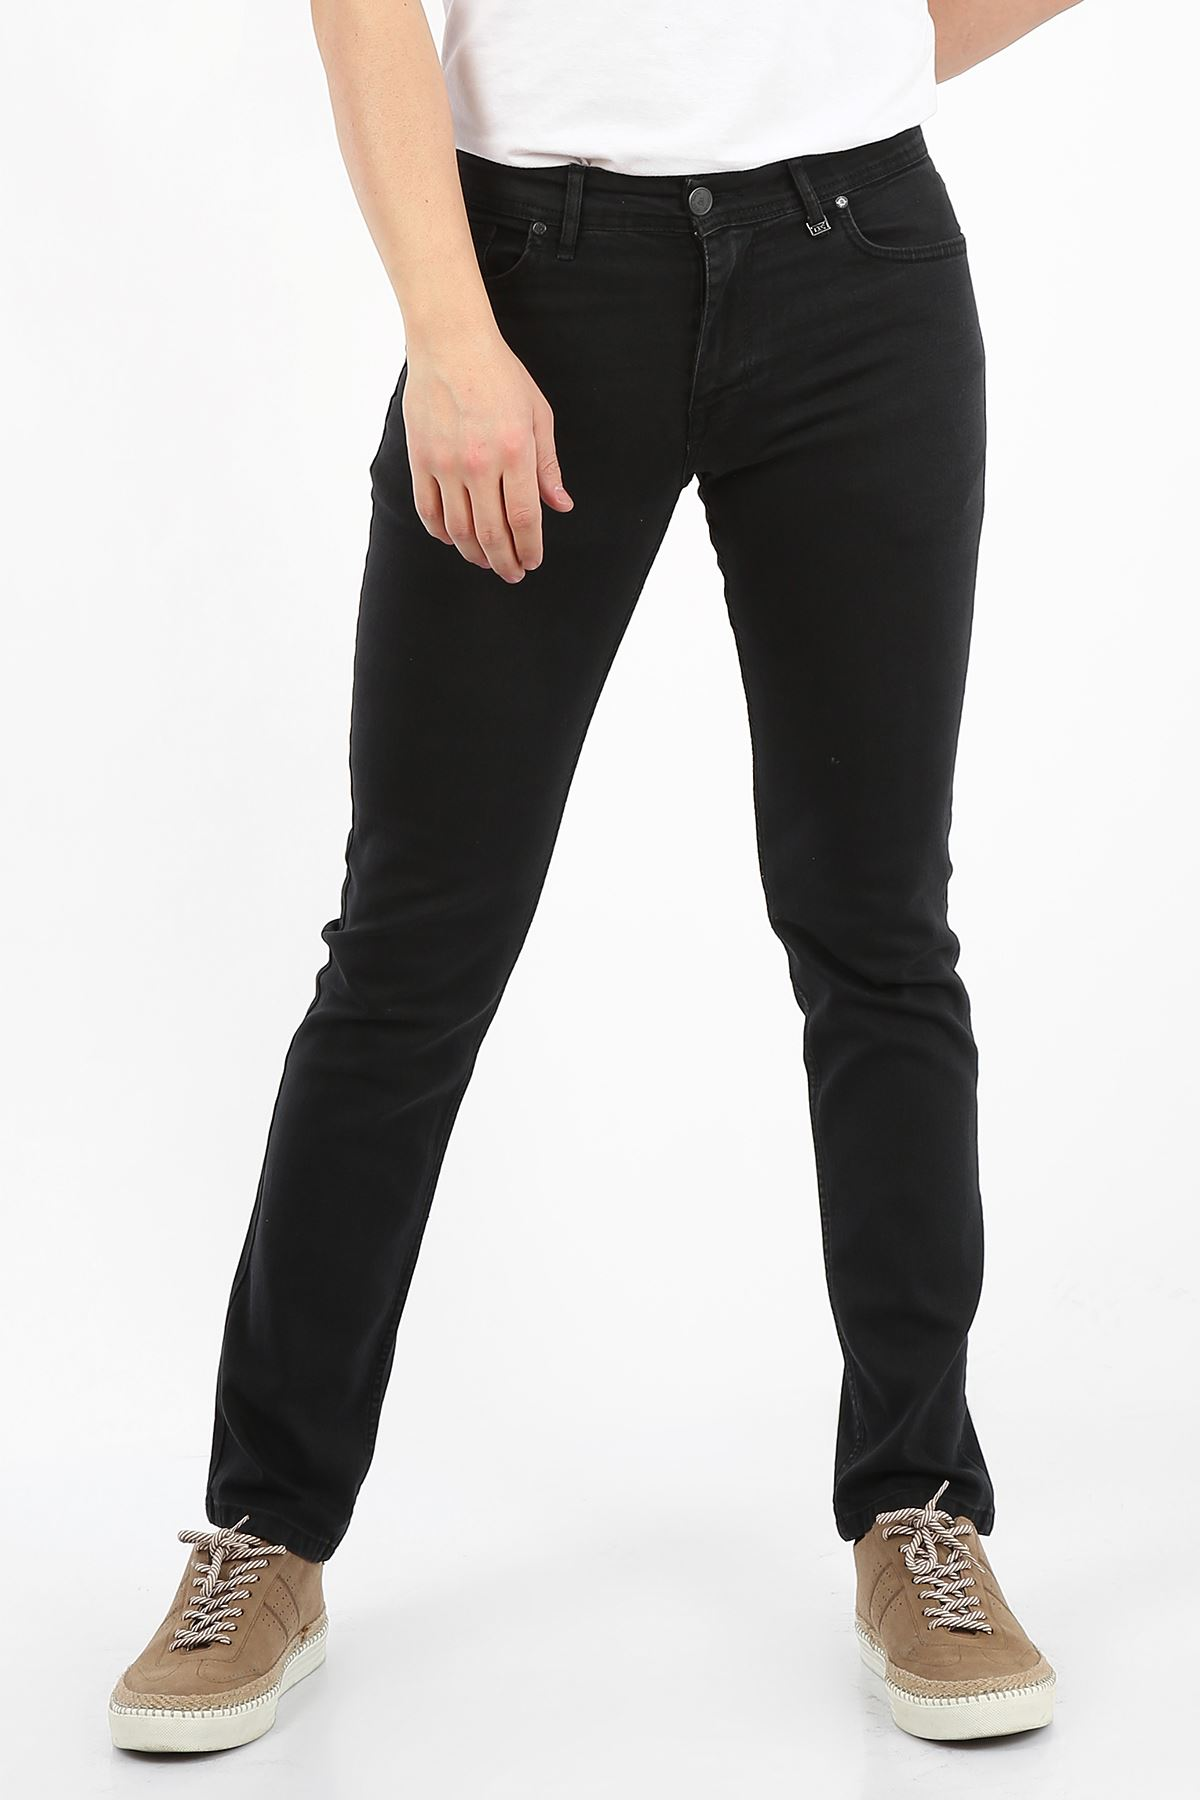 Siyah Regular Fit Fermuarlı Erkek Jeans Pantolon-FARADAY